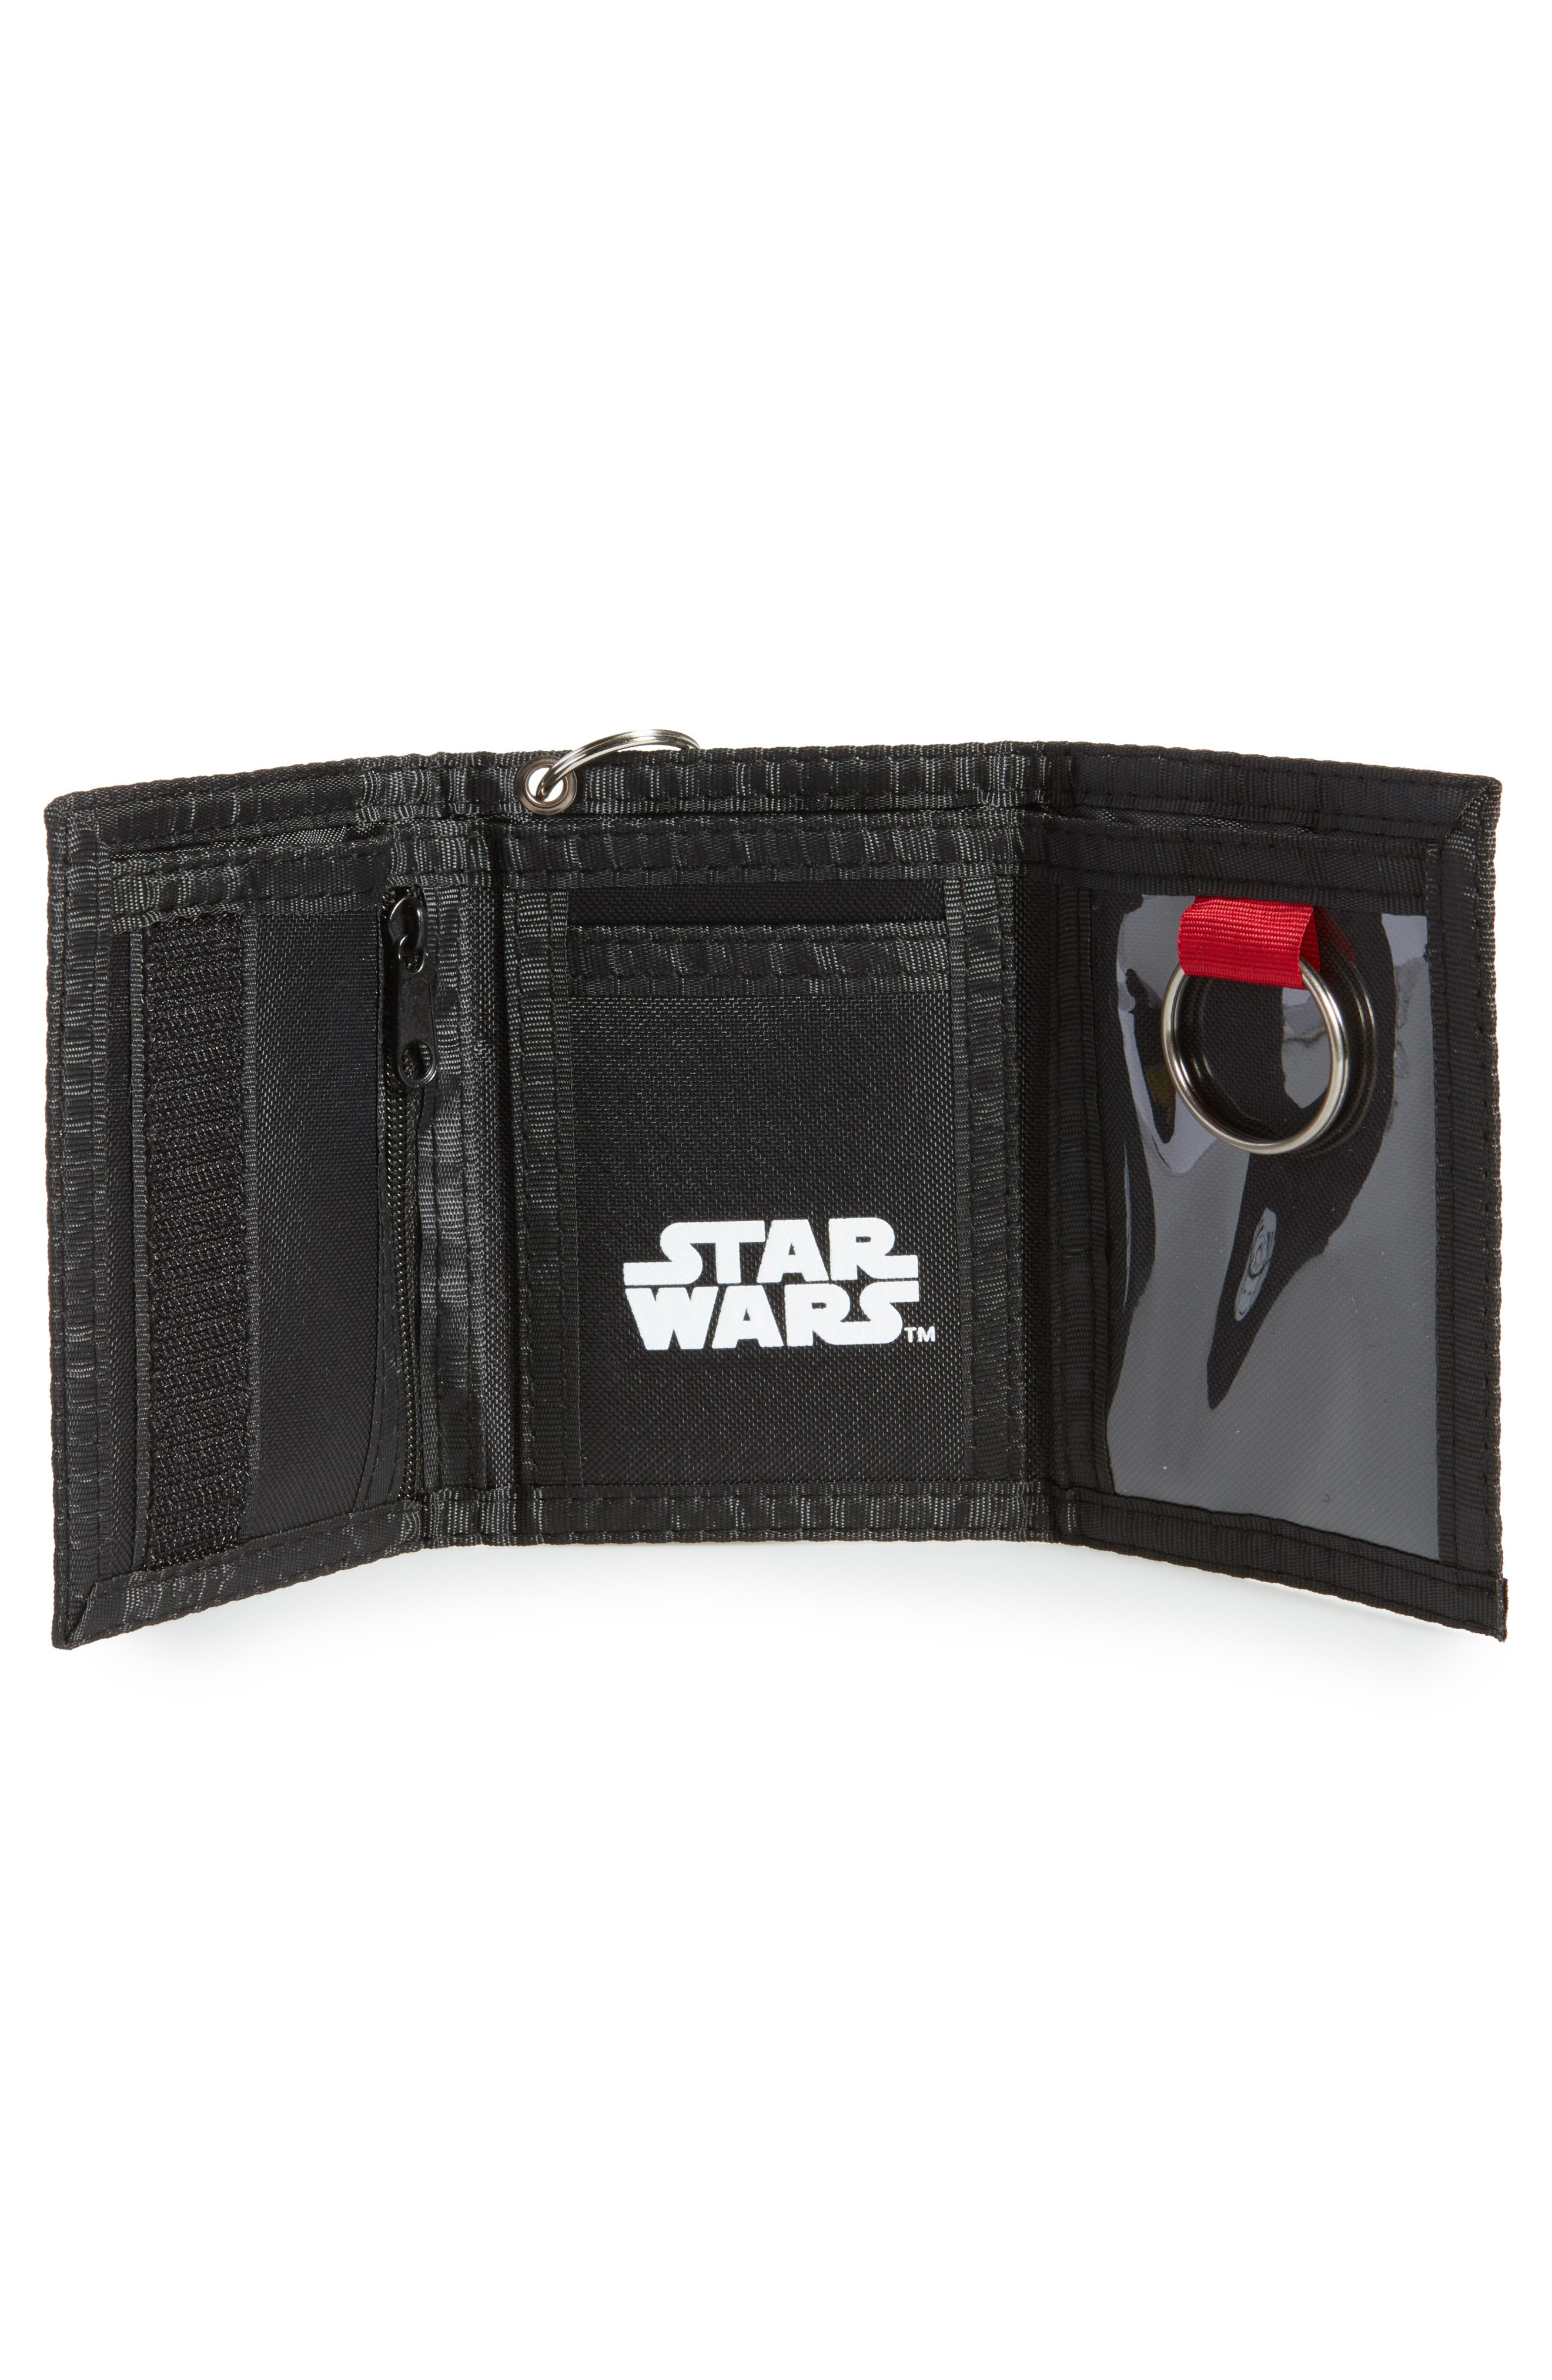 Darth Vader Wallet & Logo Light Key Chain,                             Alternate thumbnail 2, color,                             Black